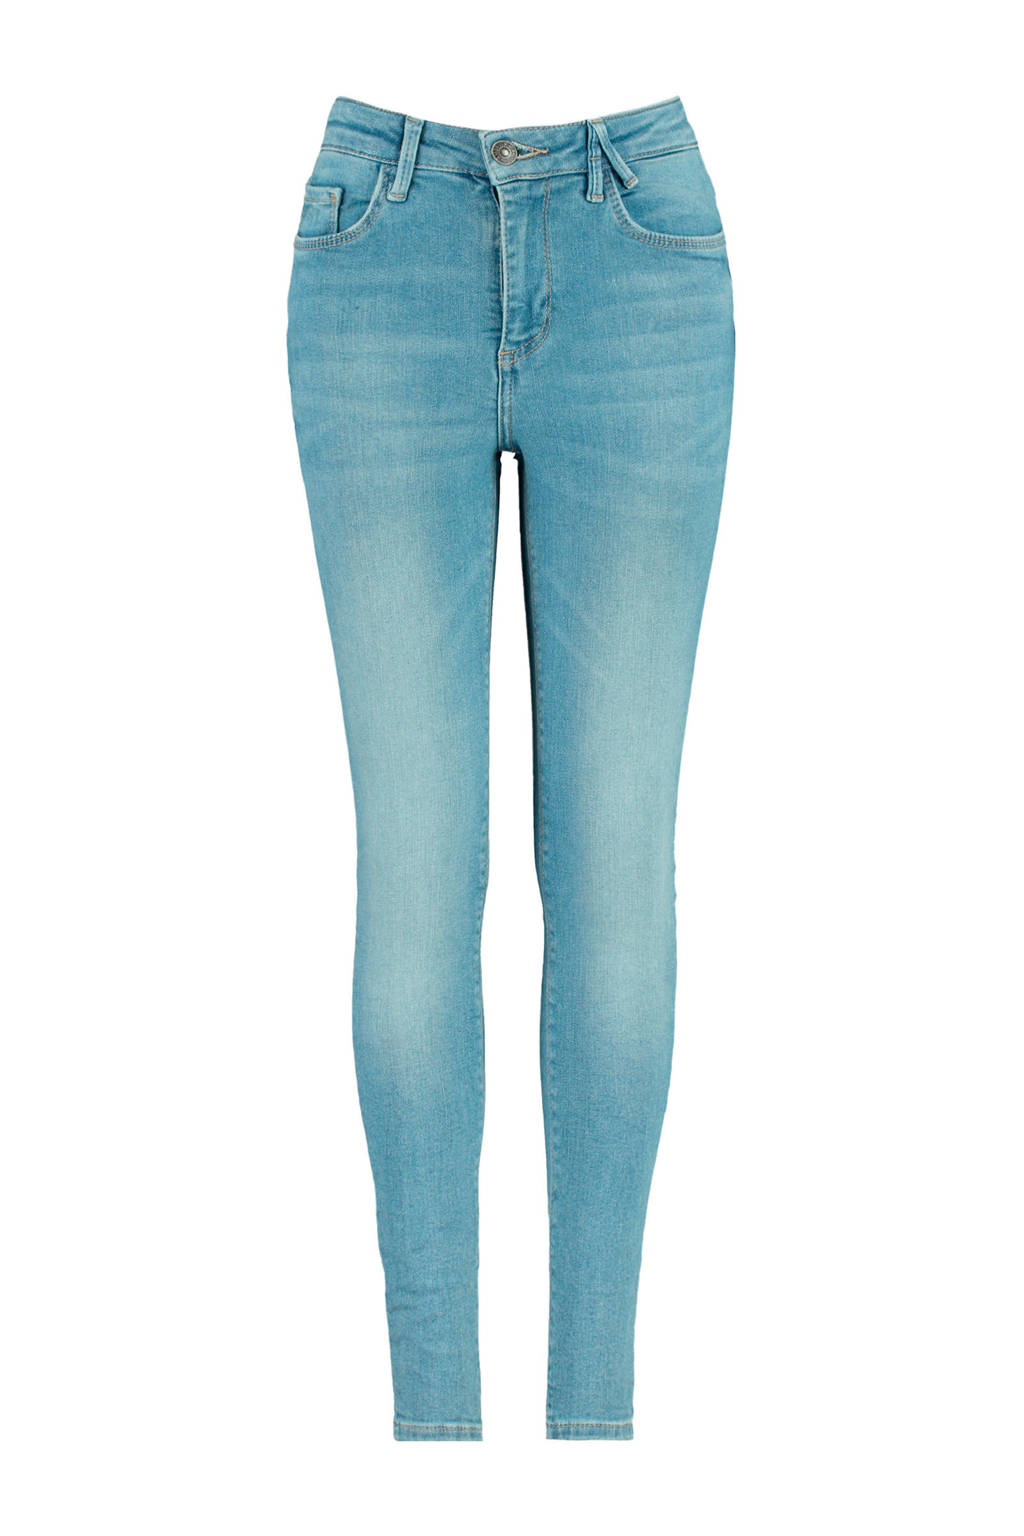 America Today Junior high waist skinny jeans light denim, Light denim